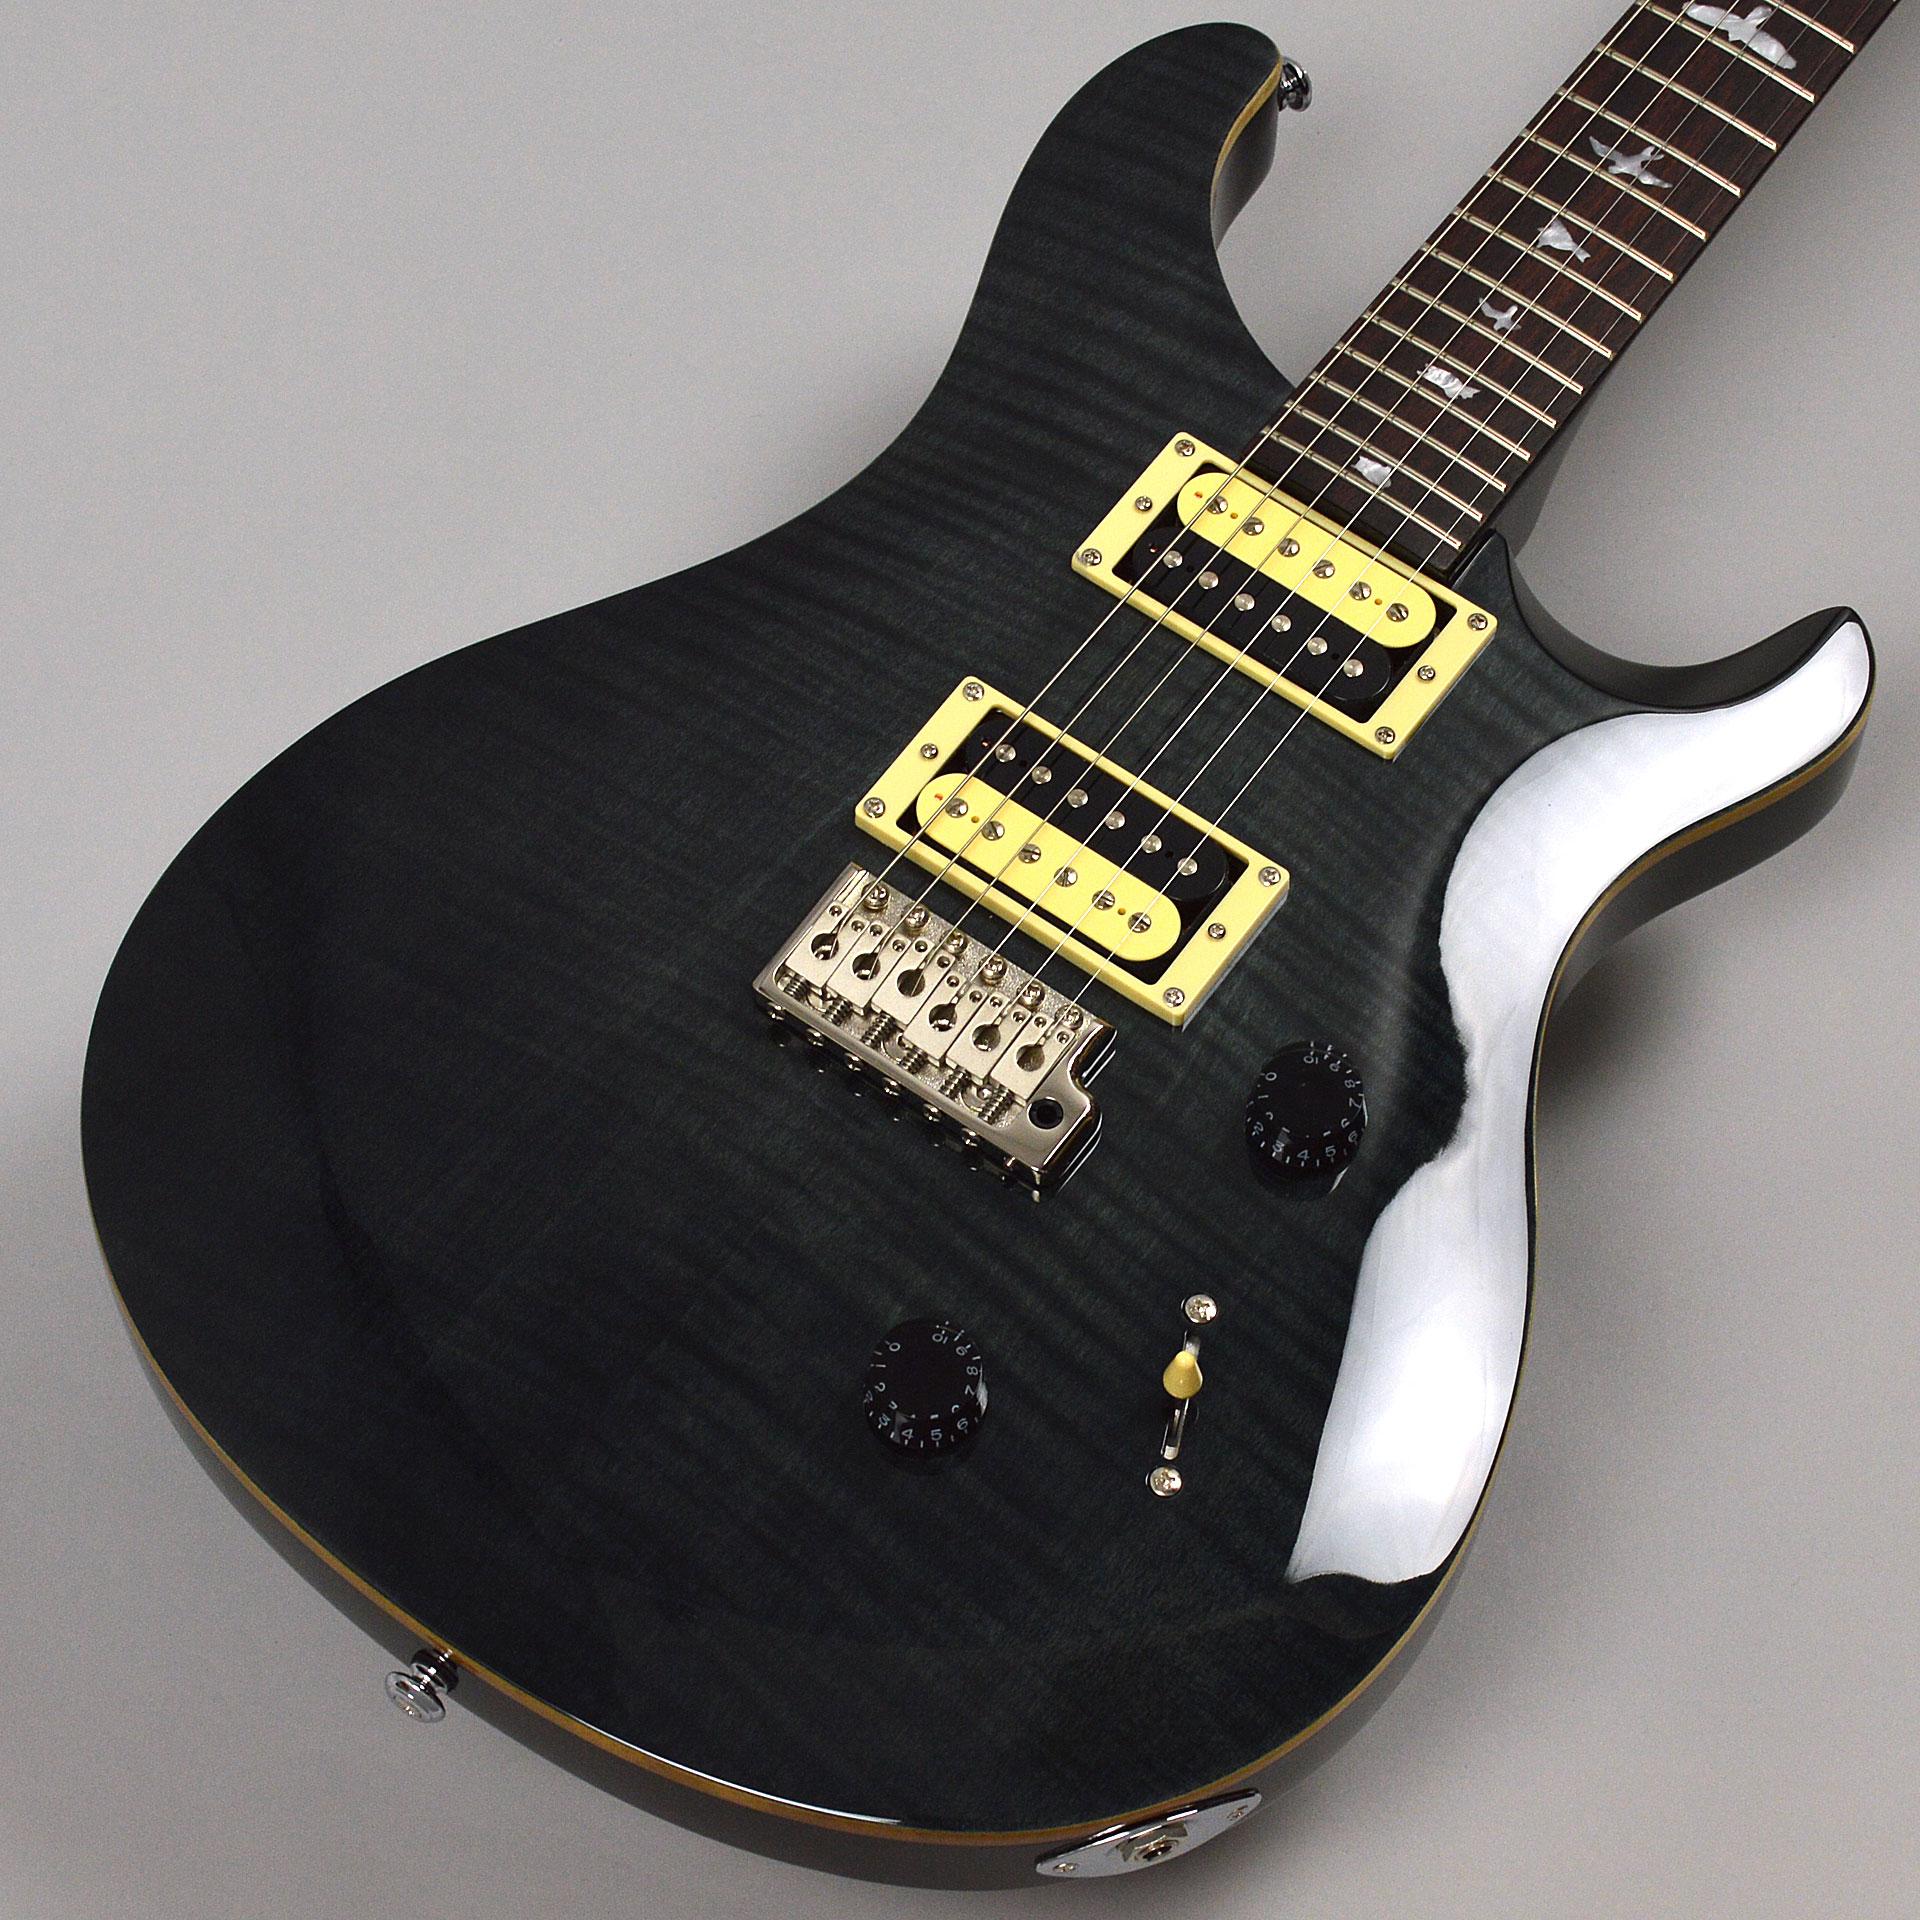 SE Custom 24 Gray Blackのボディトップ-アップ画像